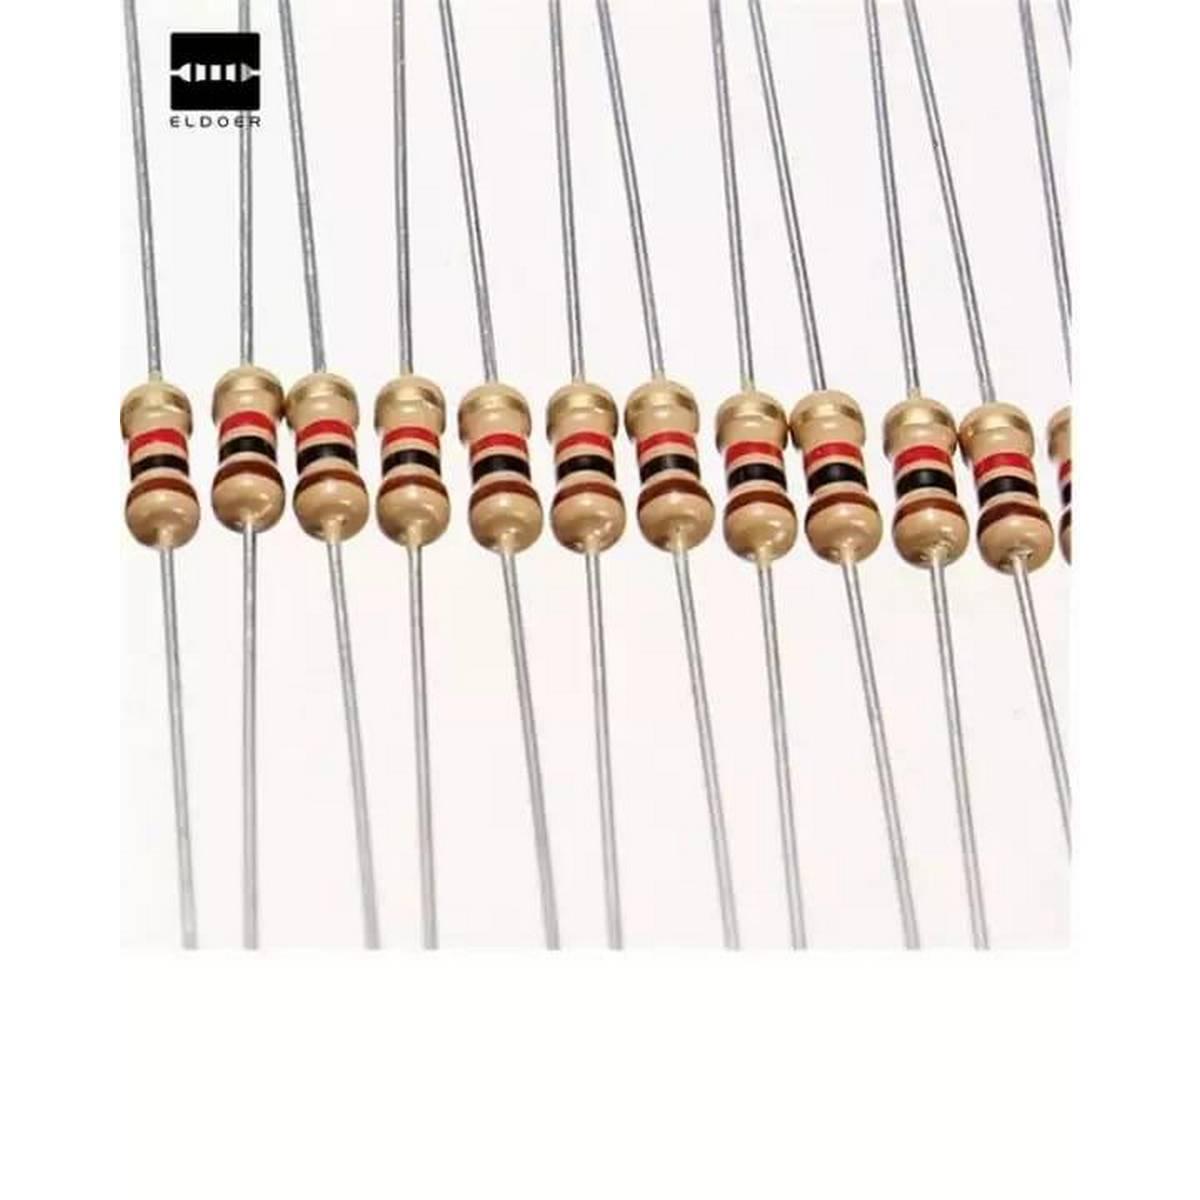 Pack Of 25 Pcs - Resistor 10K Ohm Resistance - 1/4W